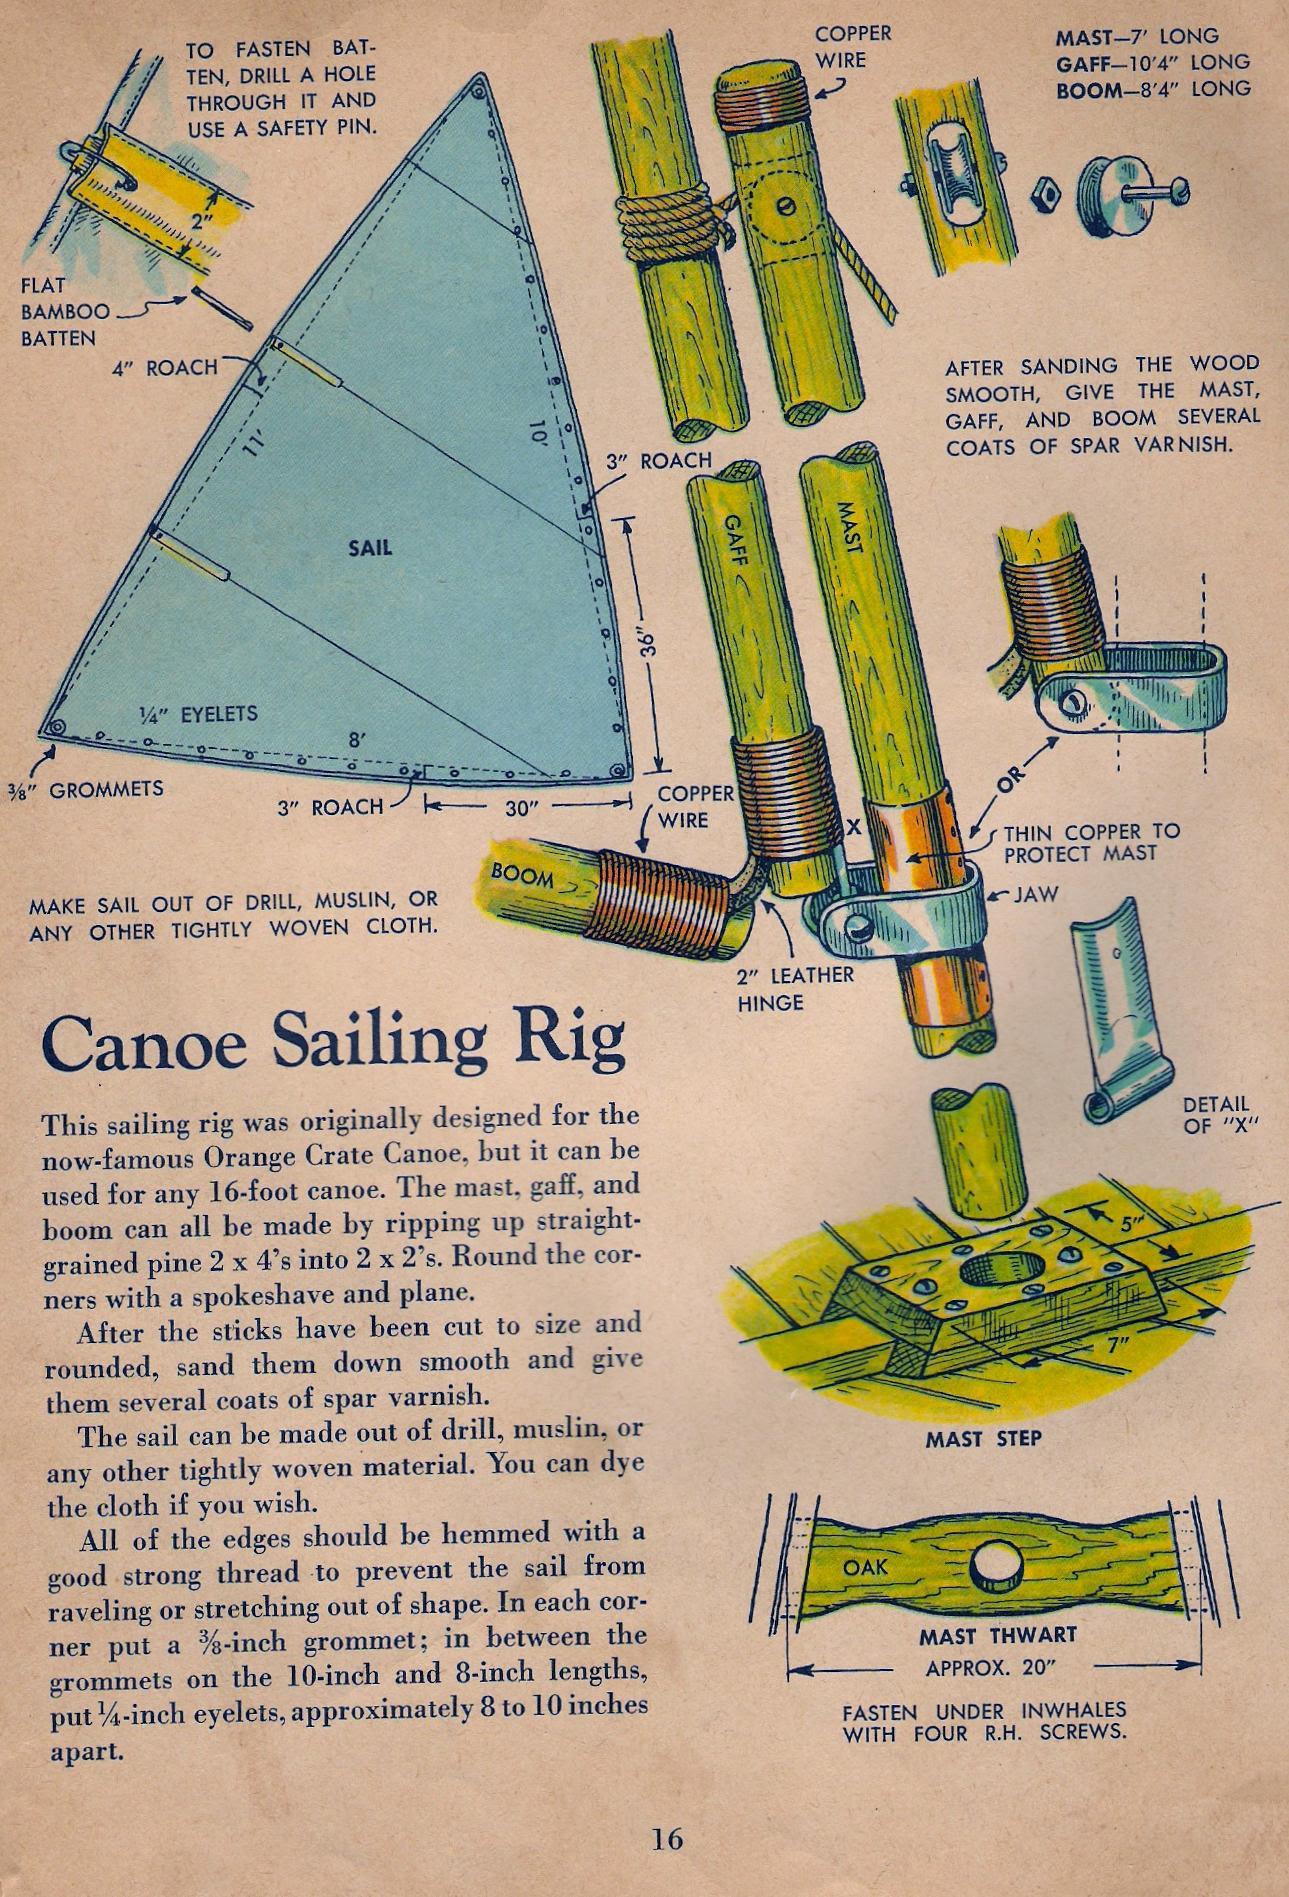 Cabin cruiser plans free Guide ~ Seen Boat plan